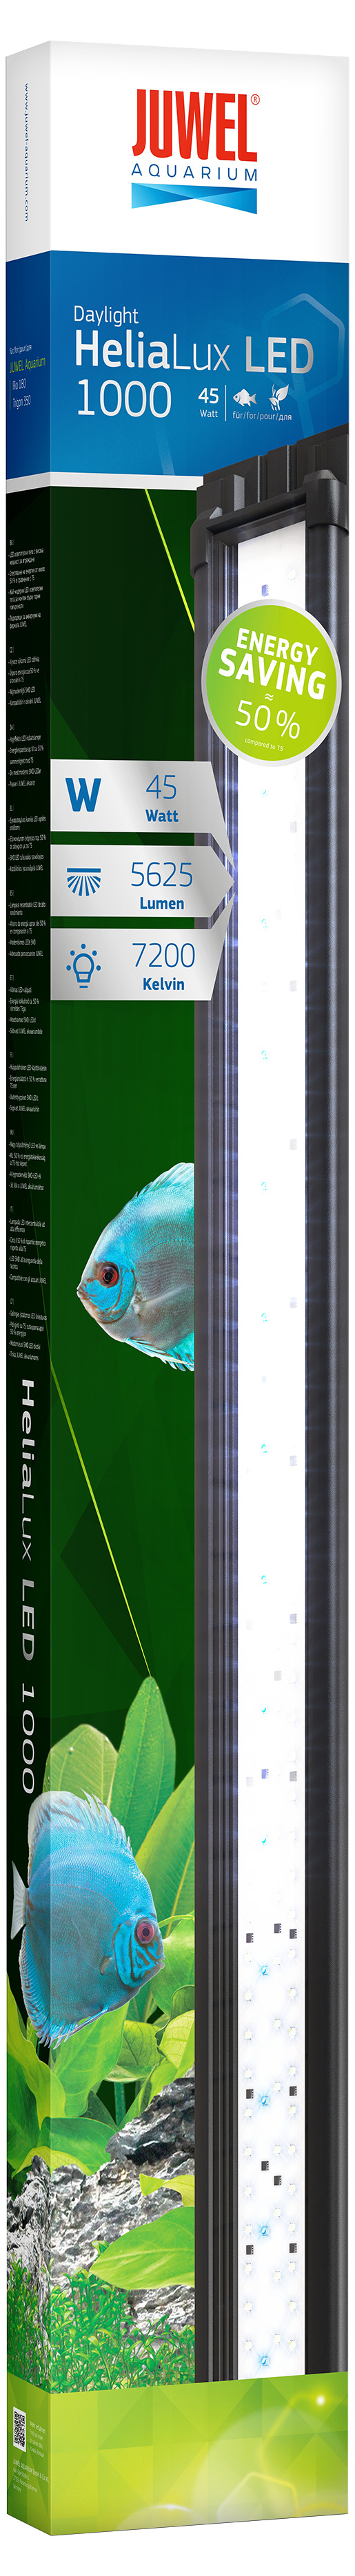 Dienas gaisma akvārijam - Juwel Helia Lux LED 1000, 45 W